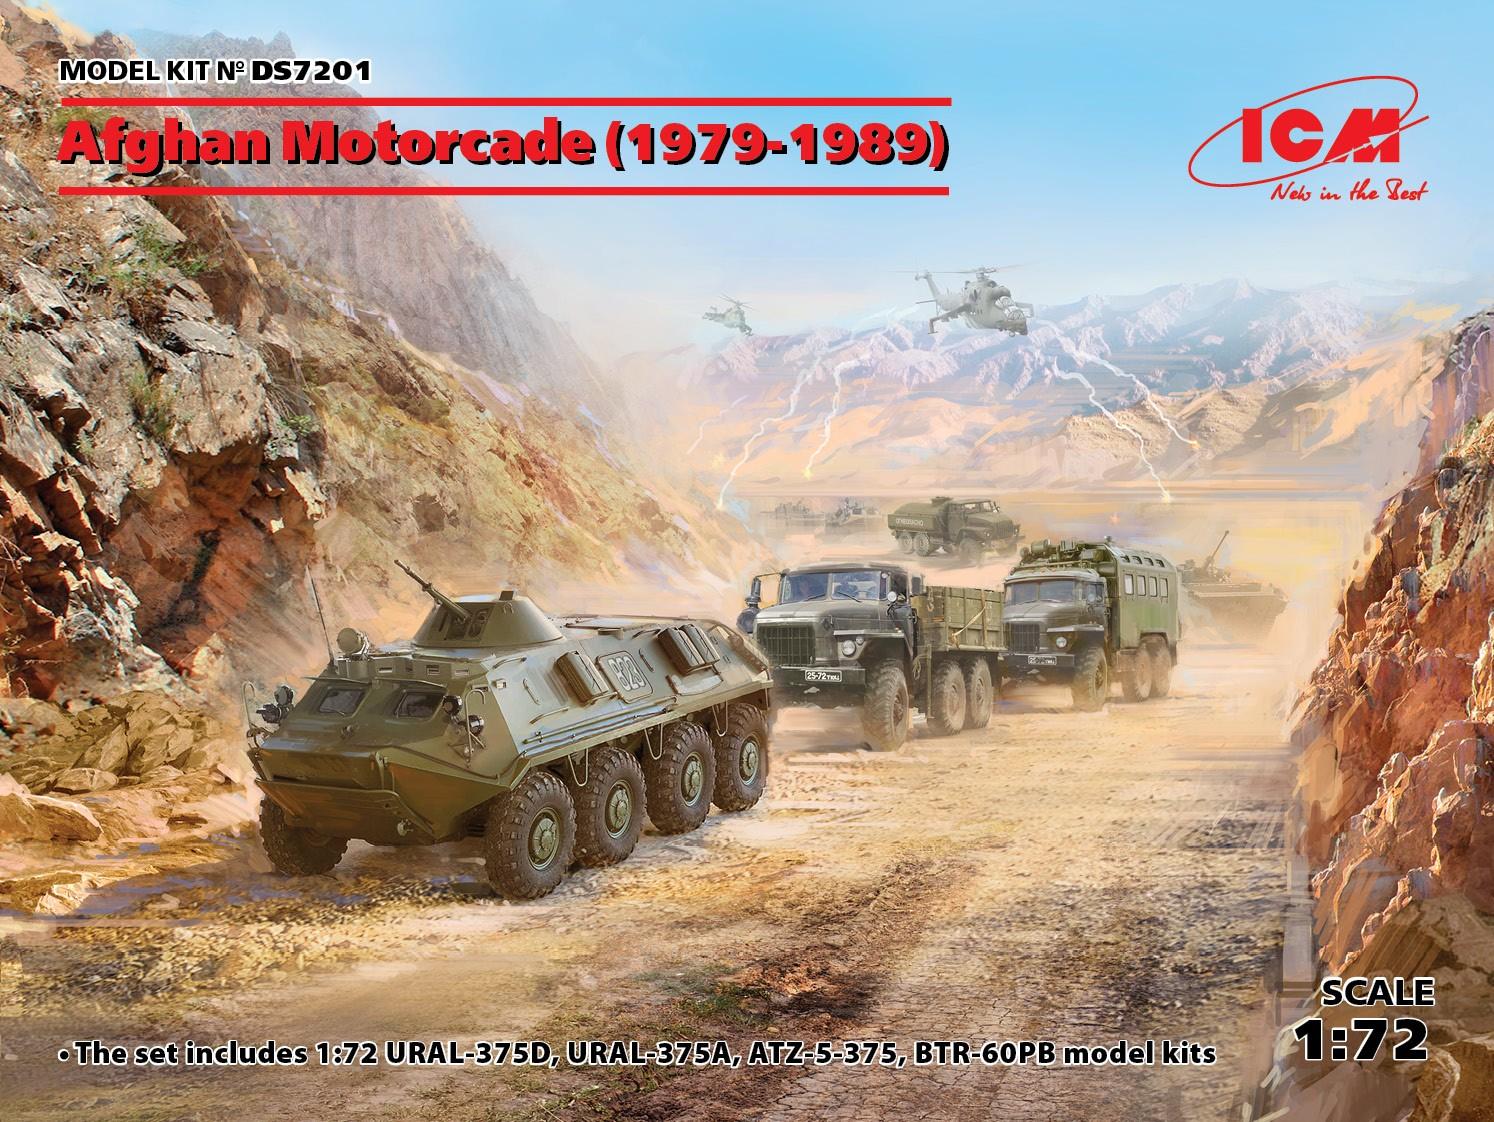 ICM Afghan Motorcade (1979-1989) (URAL-375D, URAL-375A, ATZ-5-375, BTR-60PB)